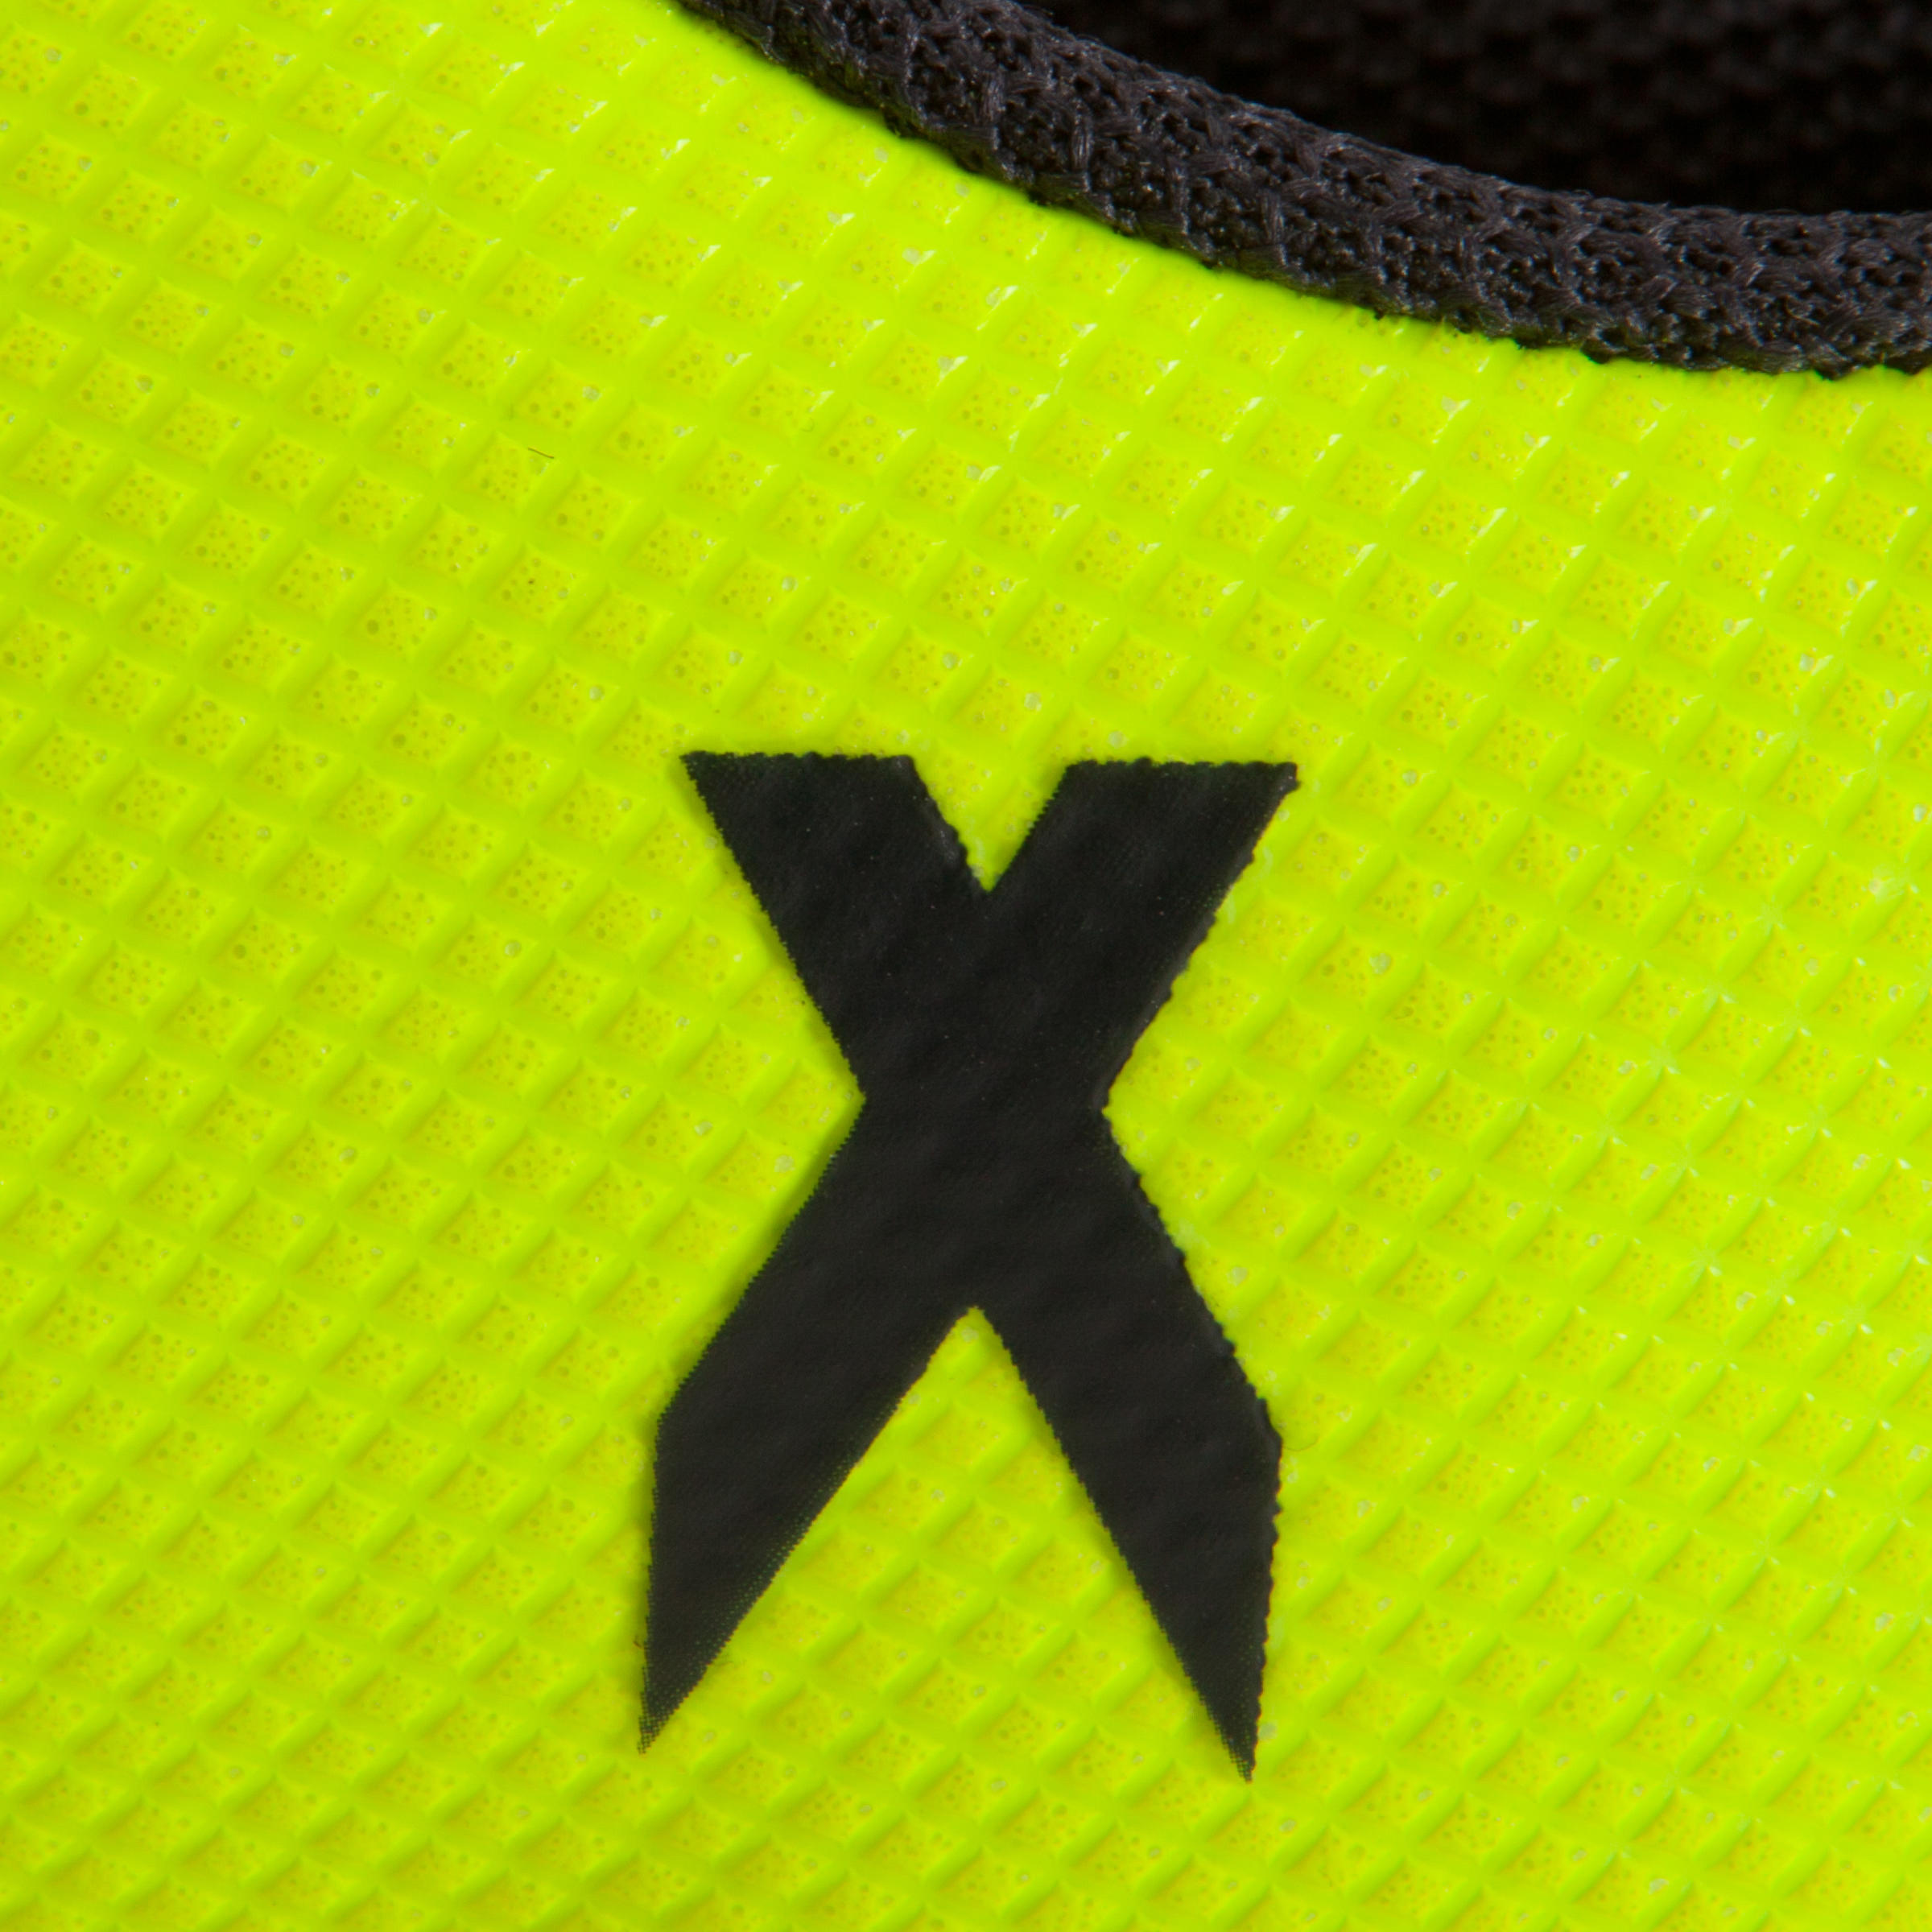 Adidas Voetbalschoenen kind X 17.4 FG online kopen